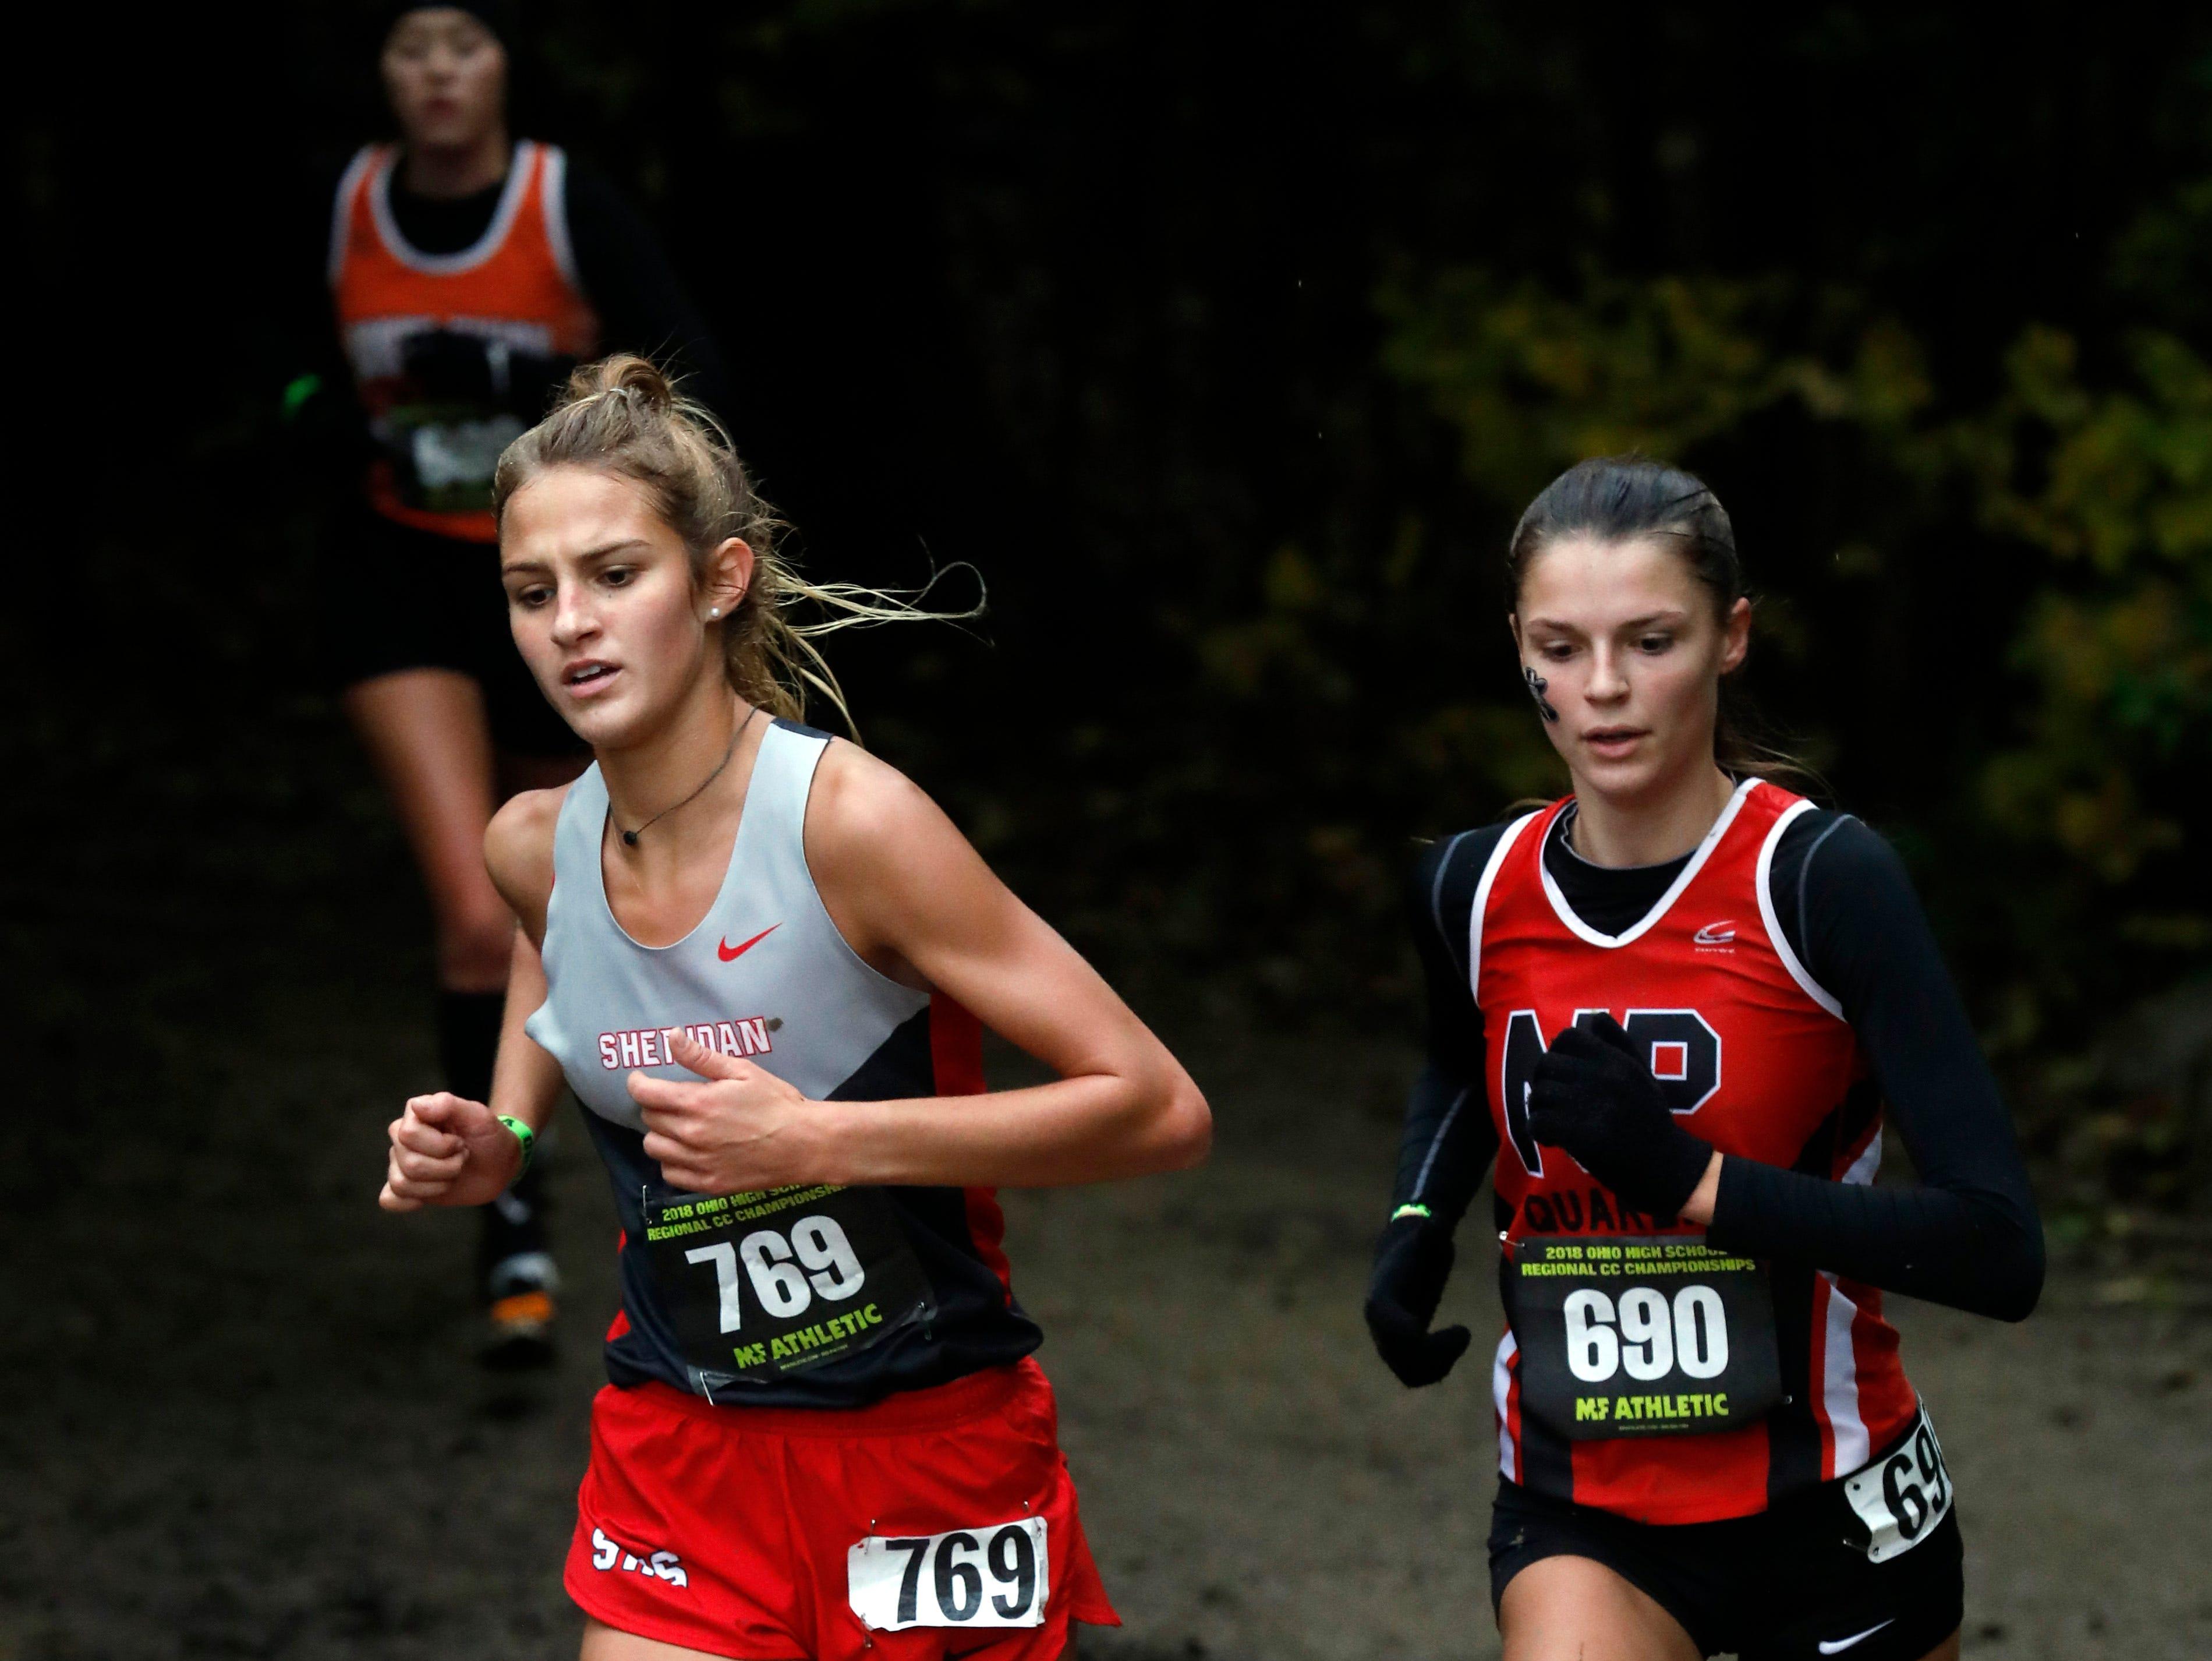 Sheridan's Emily Heath runs in the Regional Cross Country meet Saturday, Oct. 27, 2018, at Pickerington North High School in Pickerington.